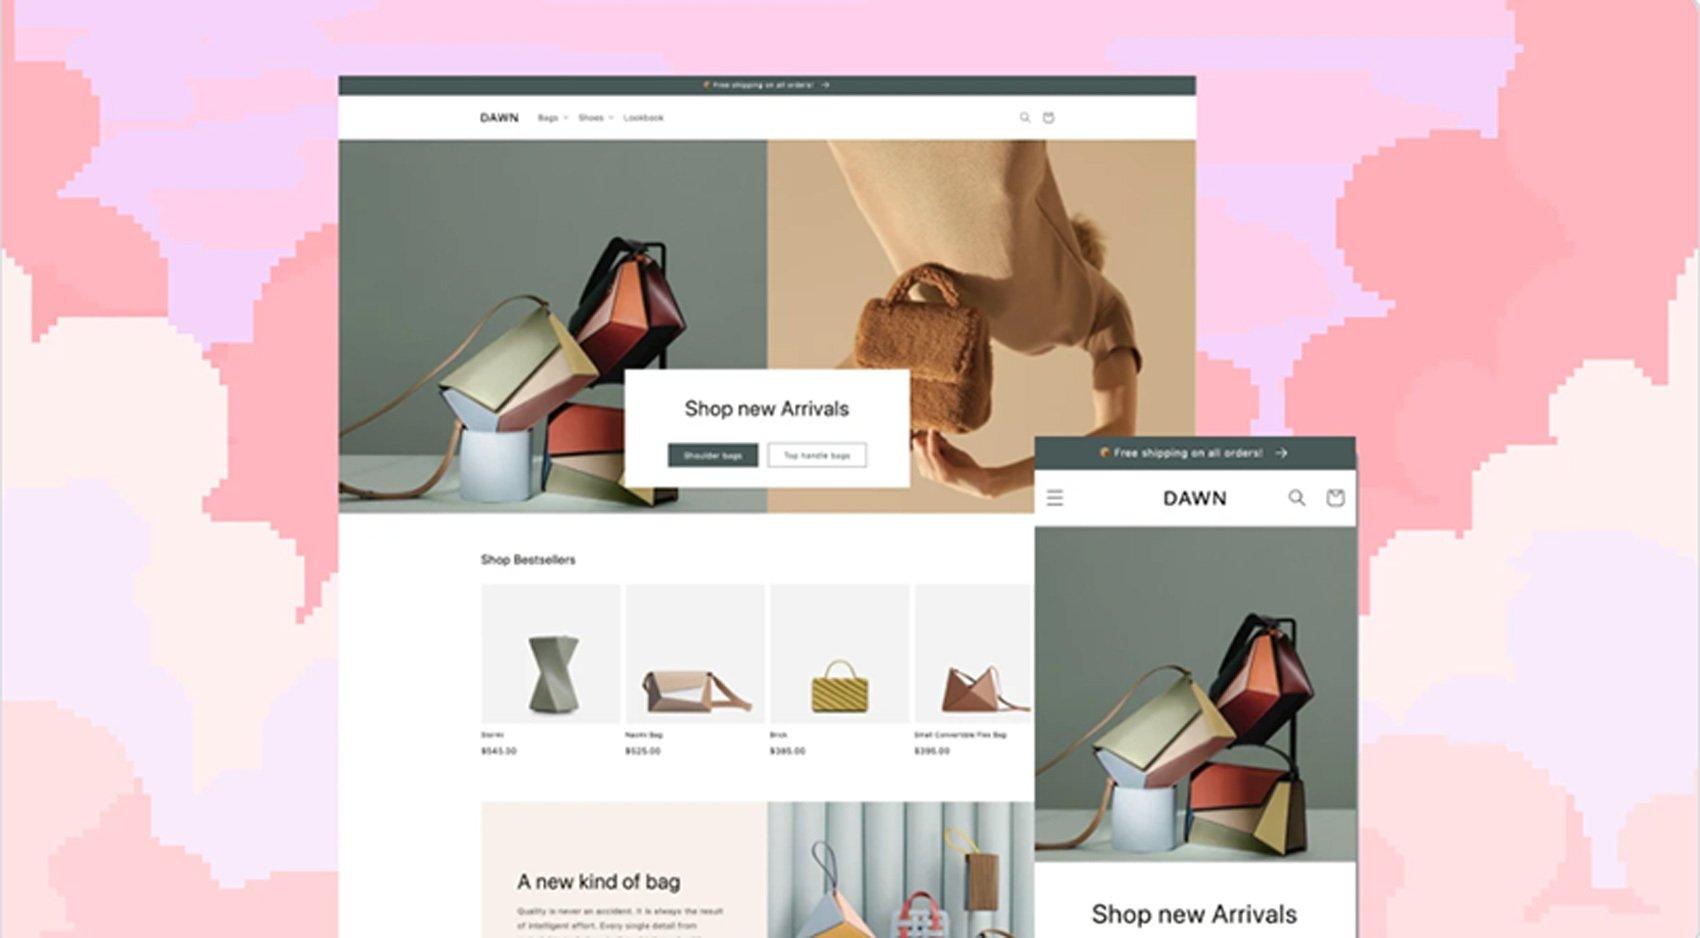 Shipify Theme Mockup On Pink Background